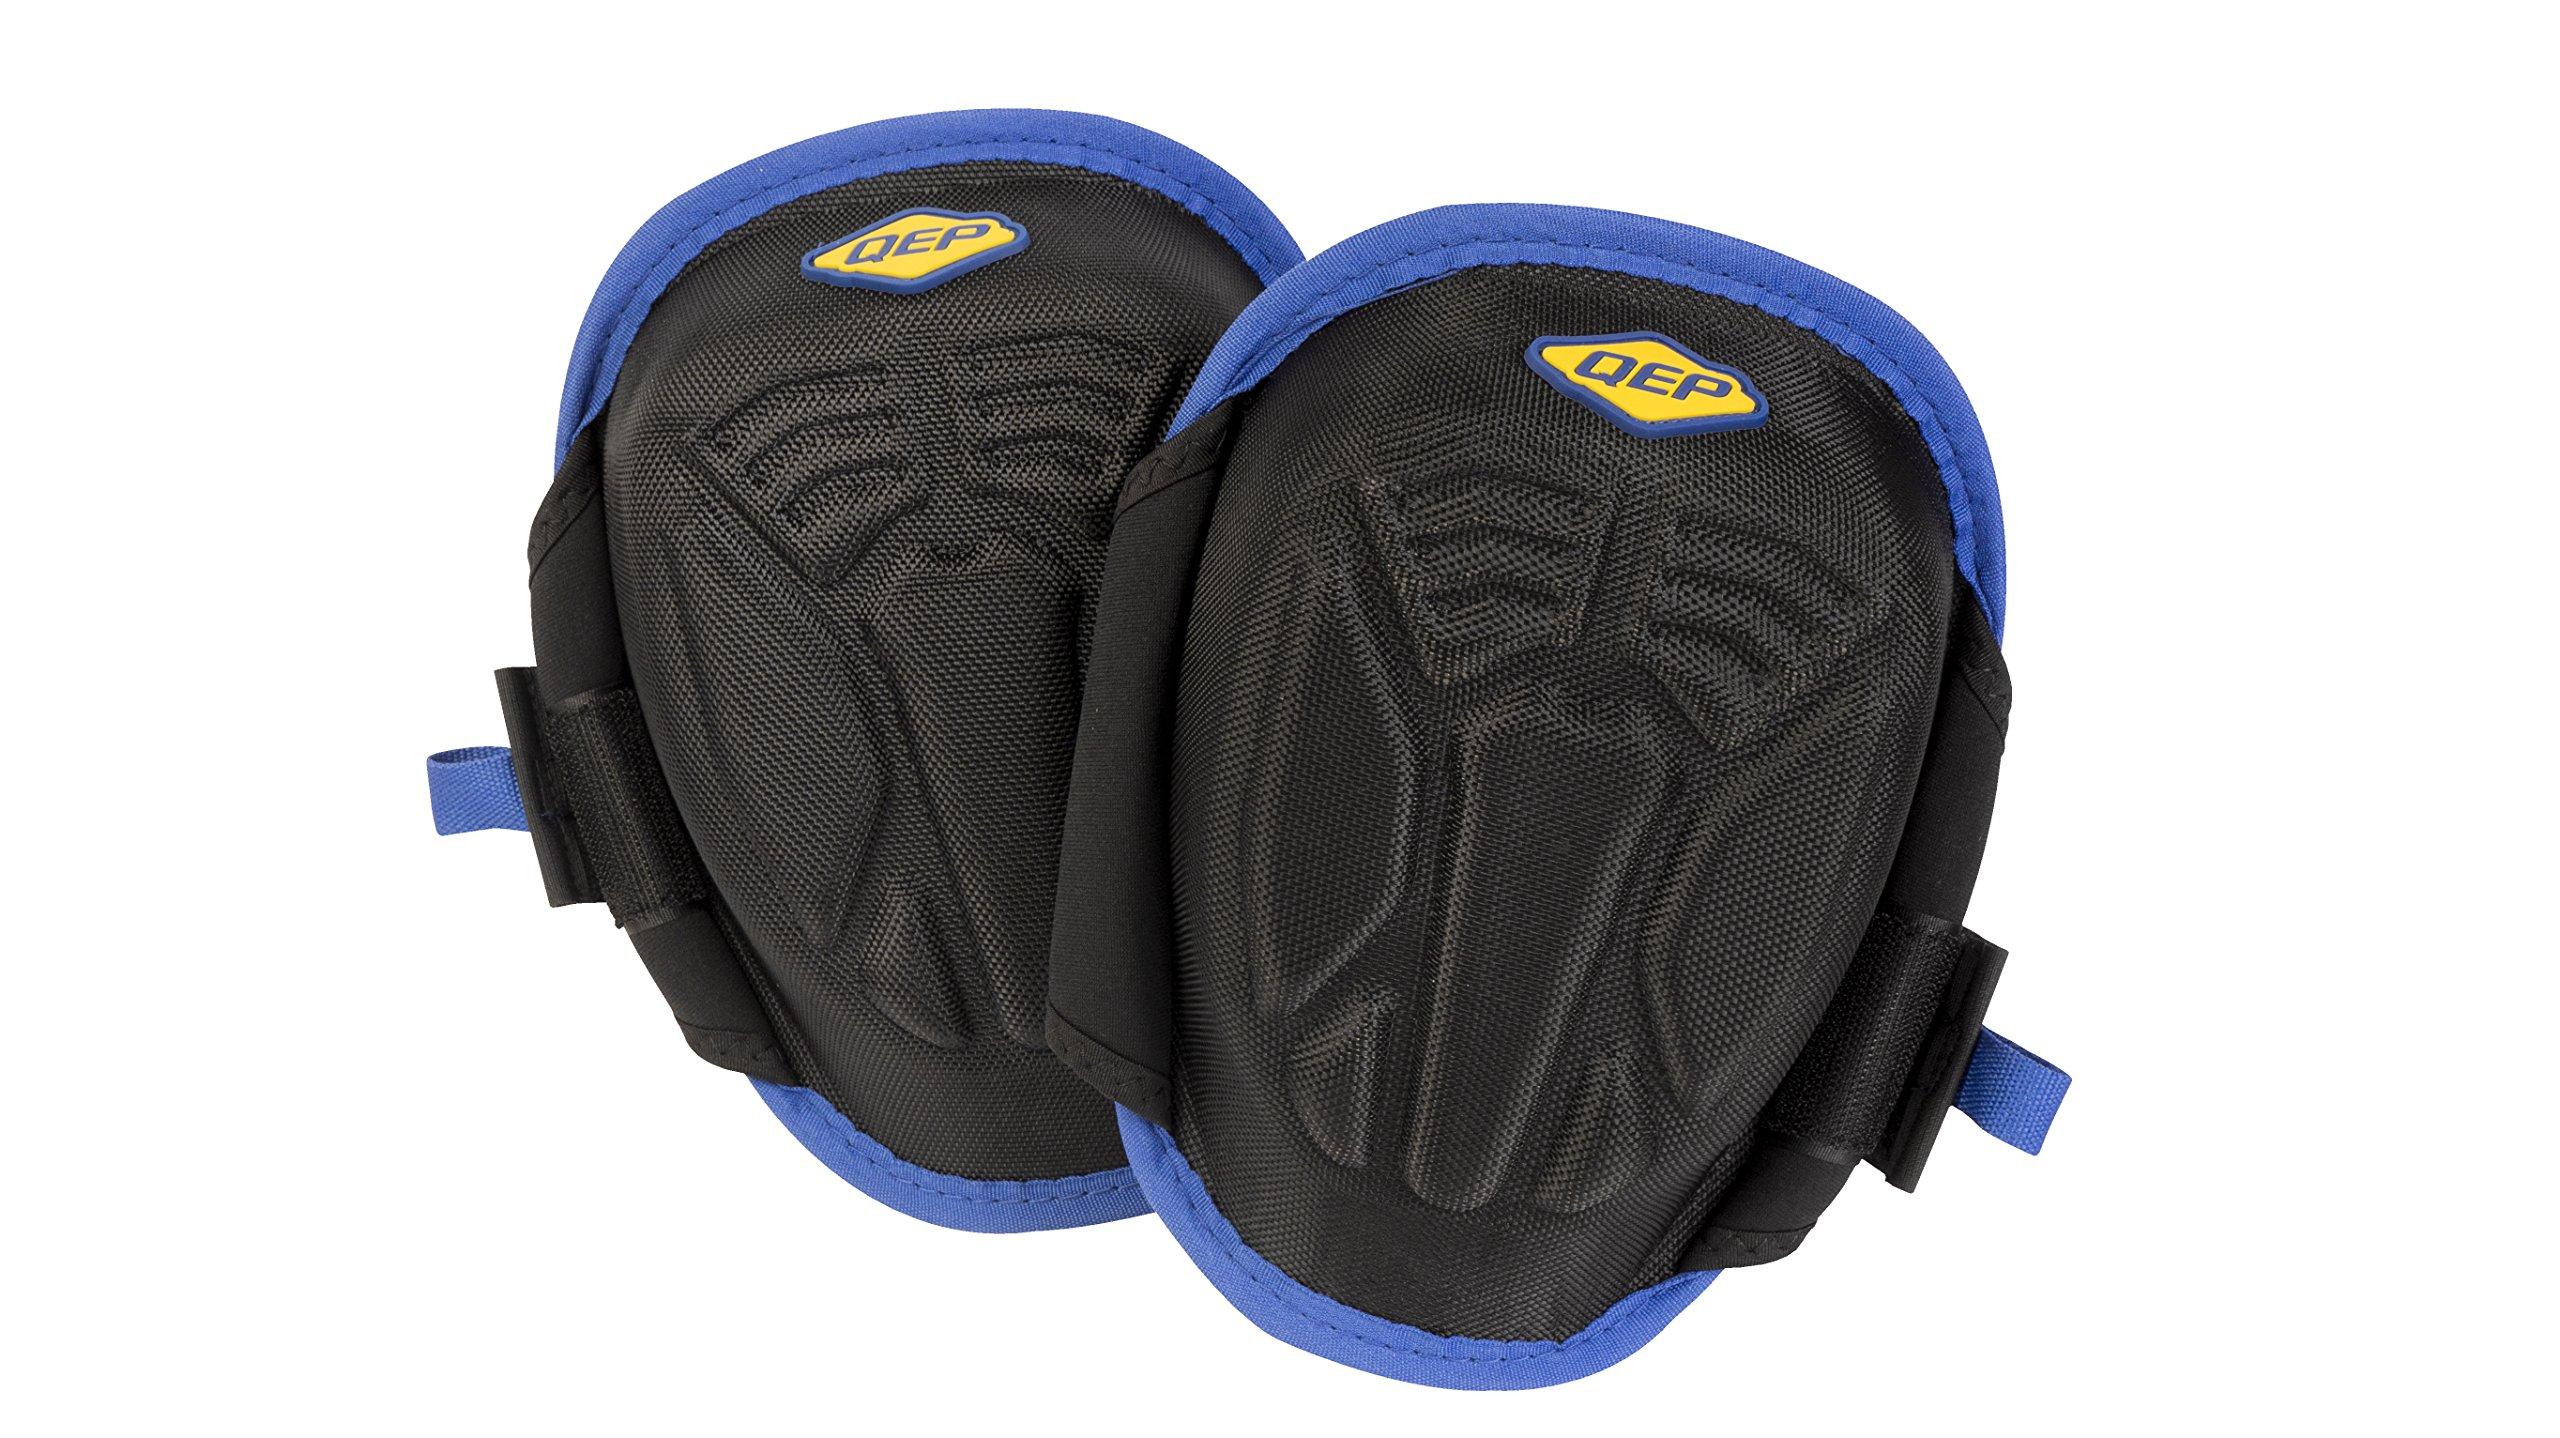 QEP 79642Q F3 SFTCP Stabilizer Knee Pad